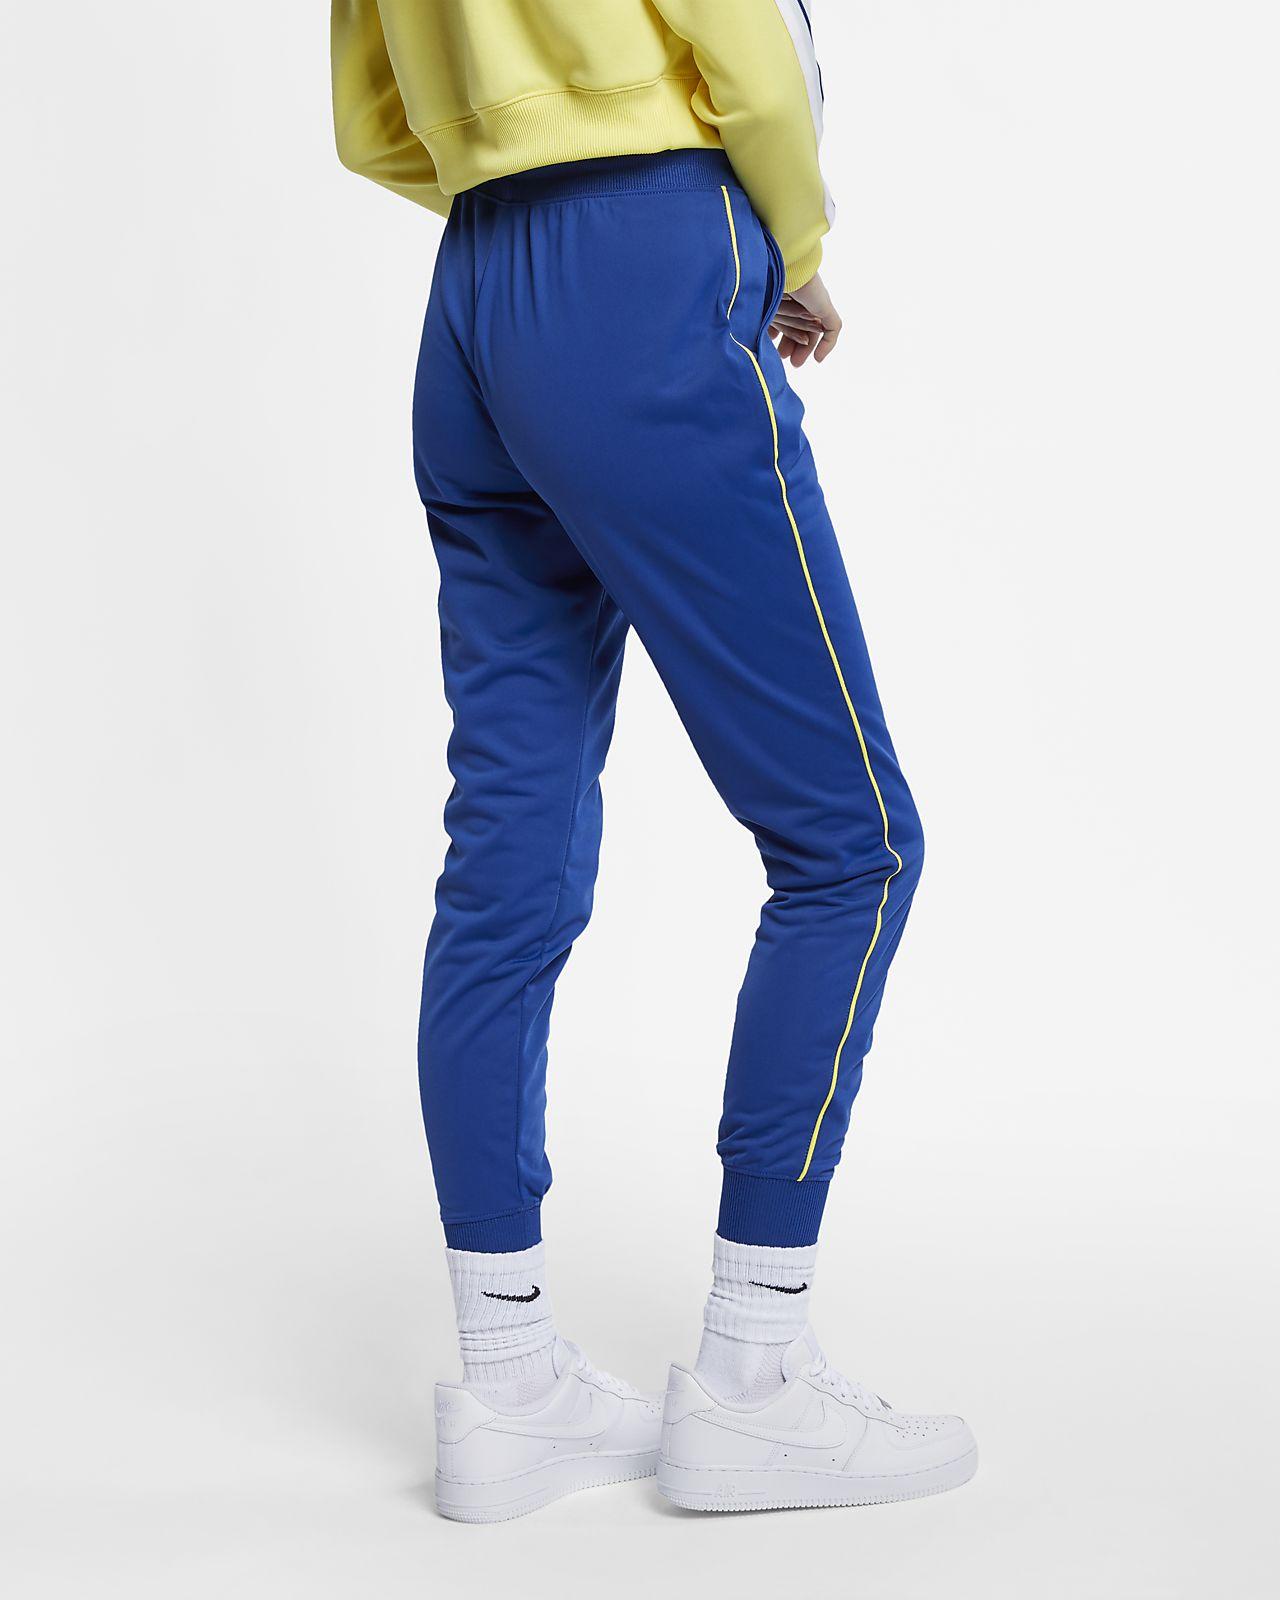 b0a7a168a6512c Nike Sportswear Heritage Damen-Jogger. Nike.com AT